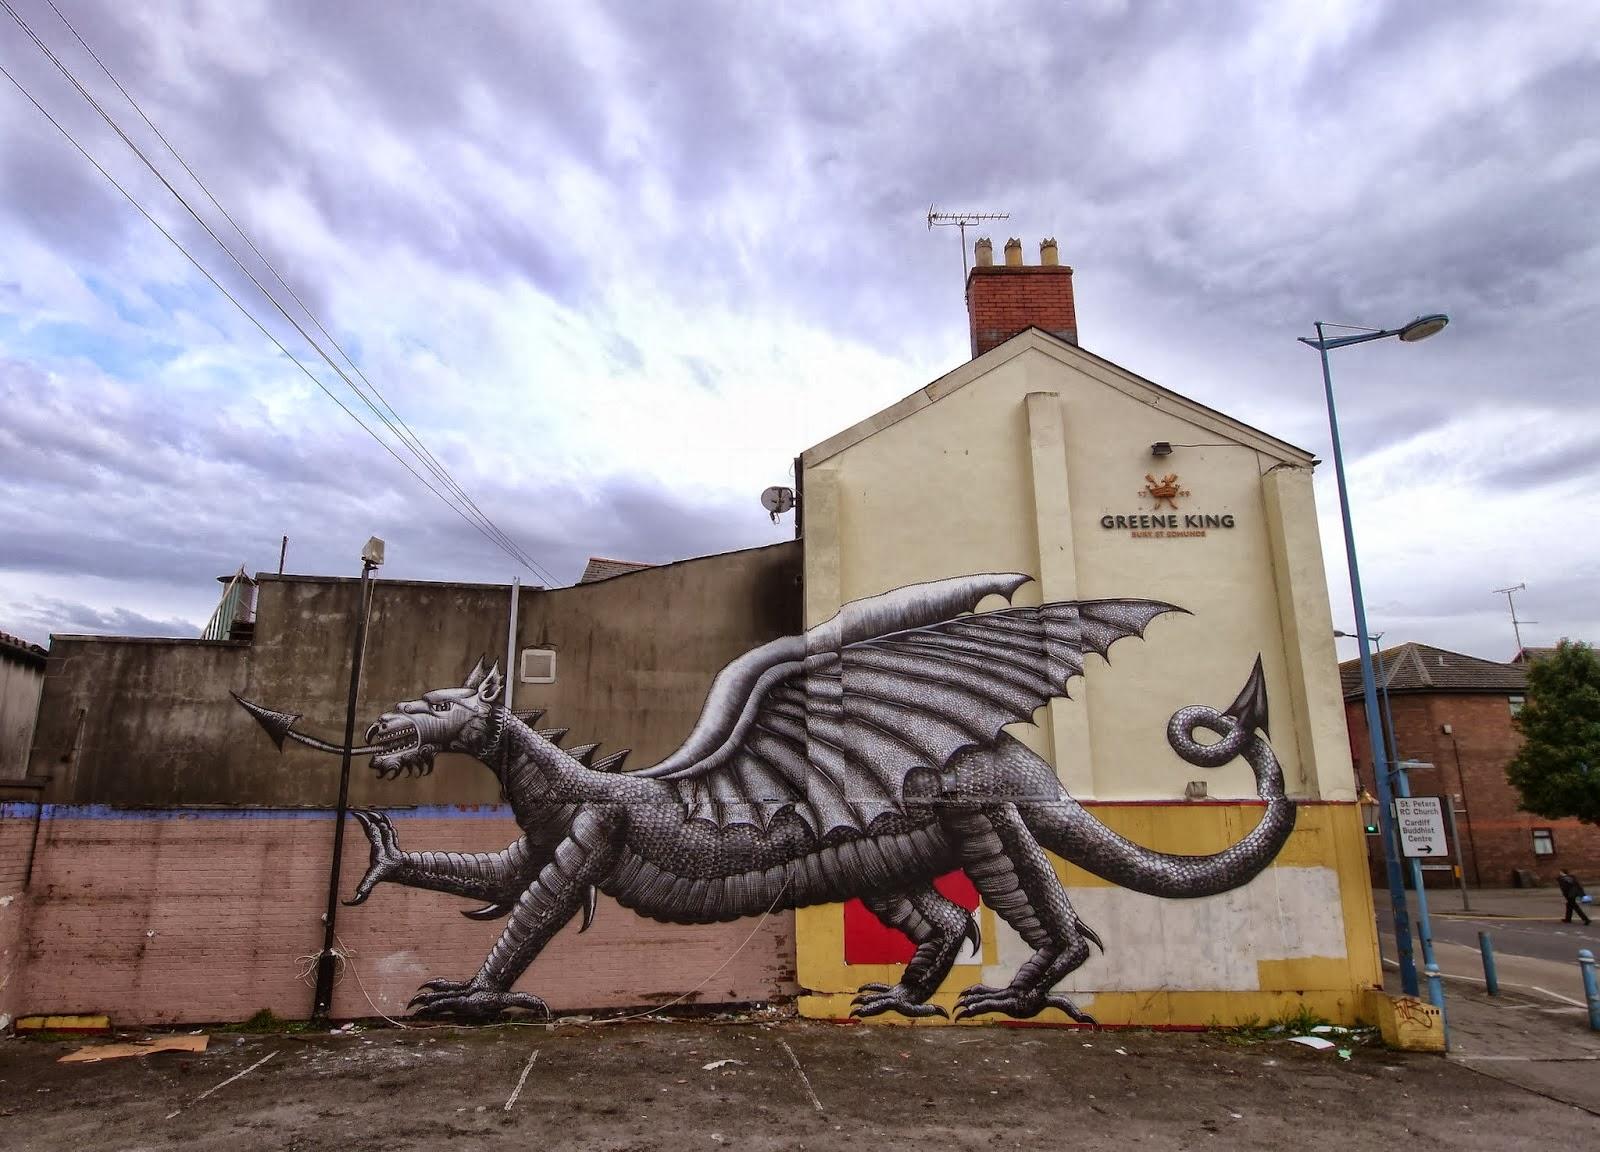 Cool Street Art By Phlegm For Empty Walls Urban Art Festival In Cardiff Wales